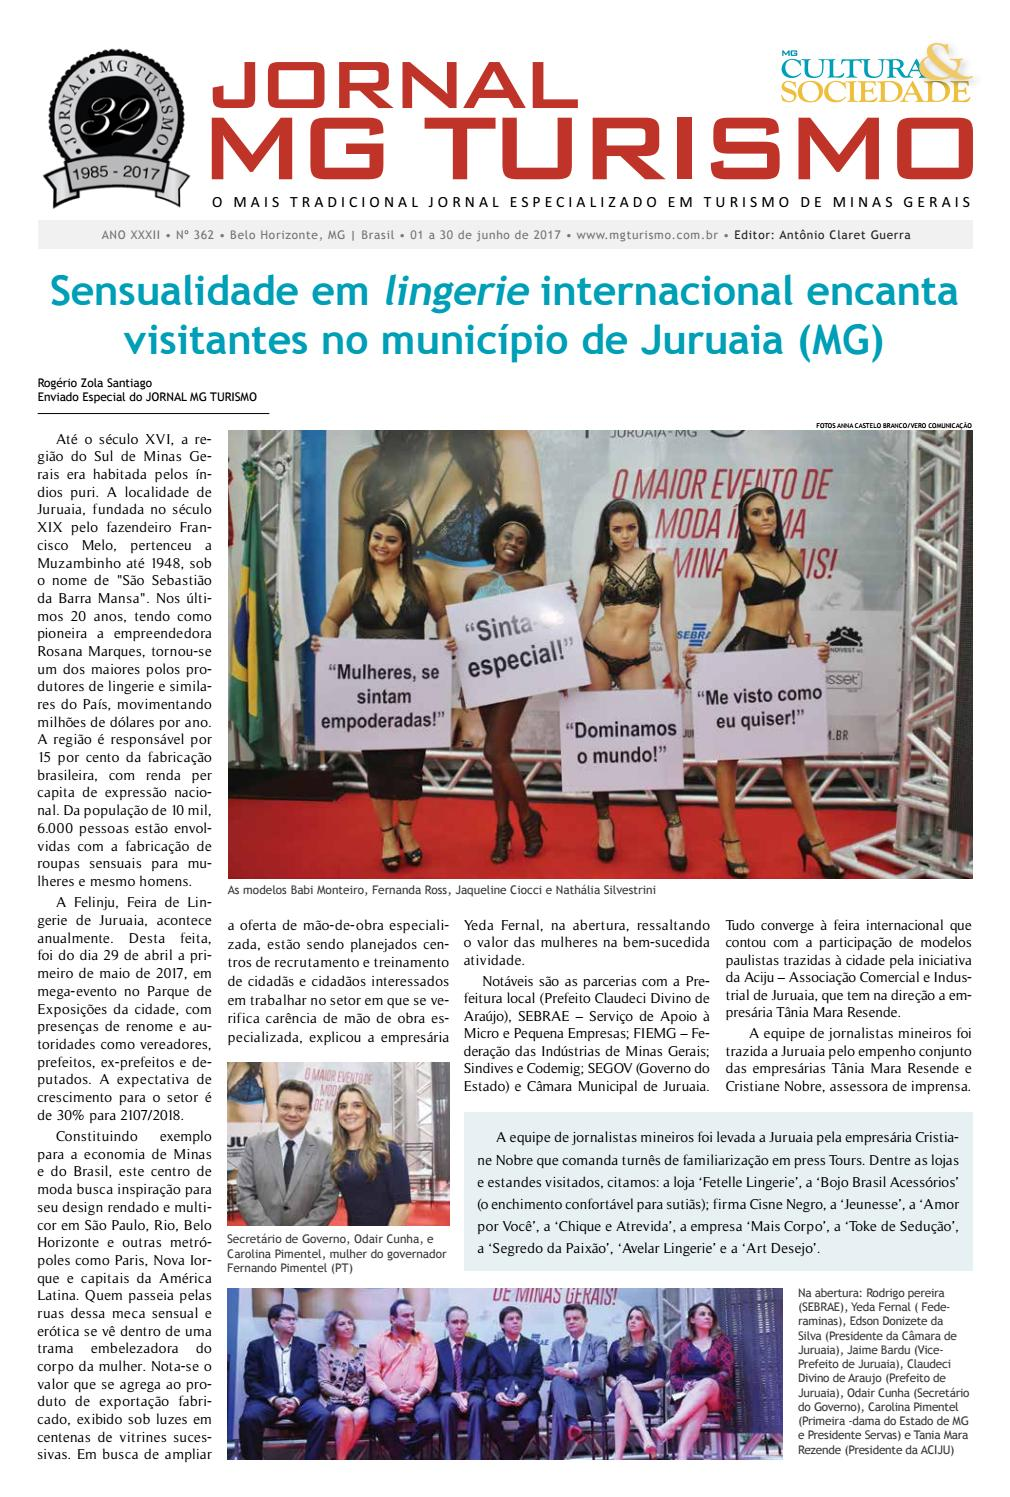 dcd045d11 Jornal MGTURISMO - Edição 362 - Junho 2017 by JORNAL MG TURISMO - issuu